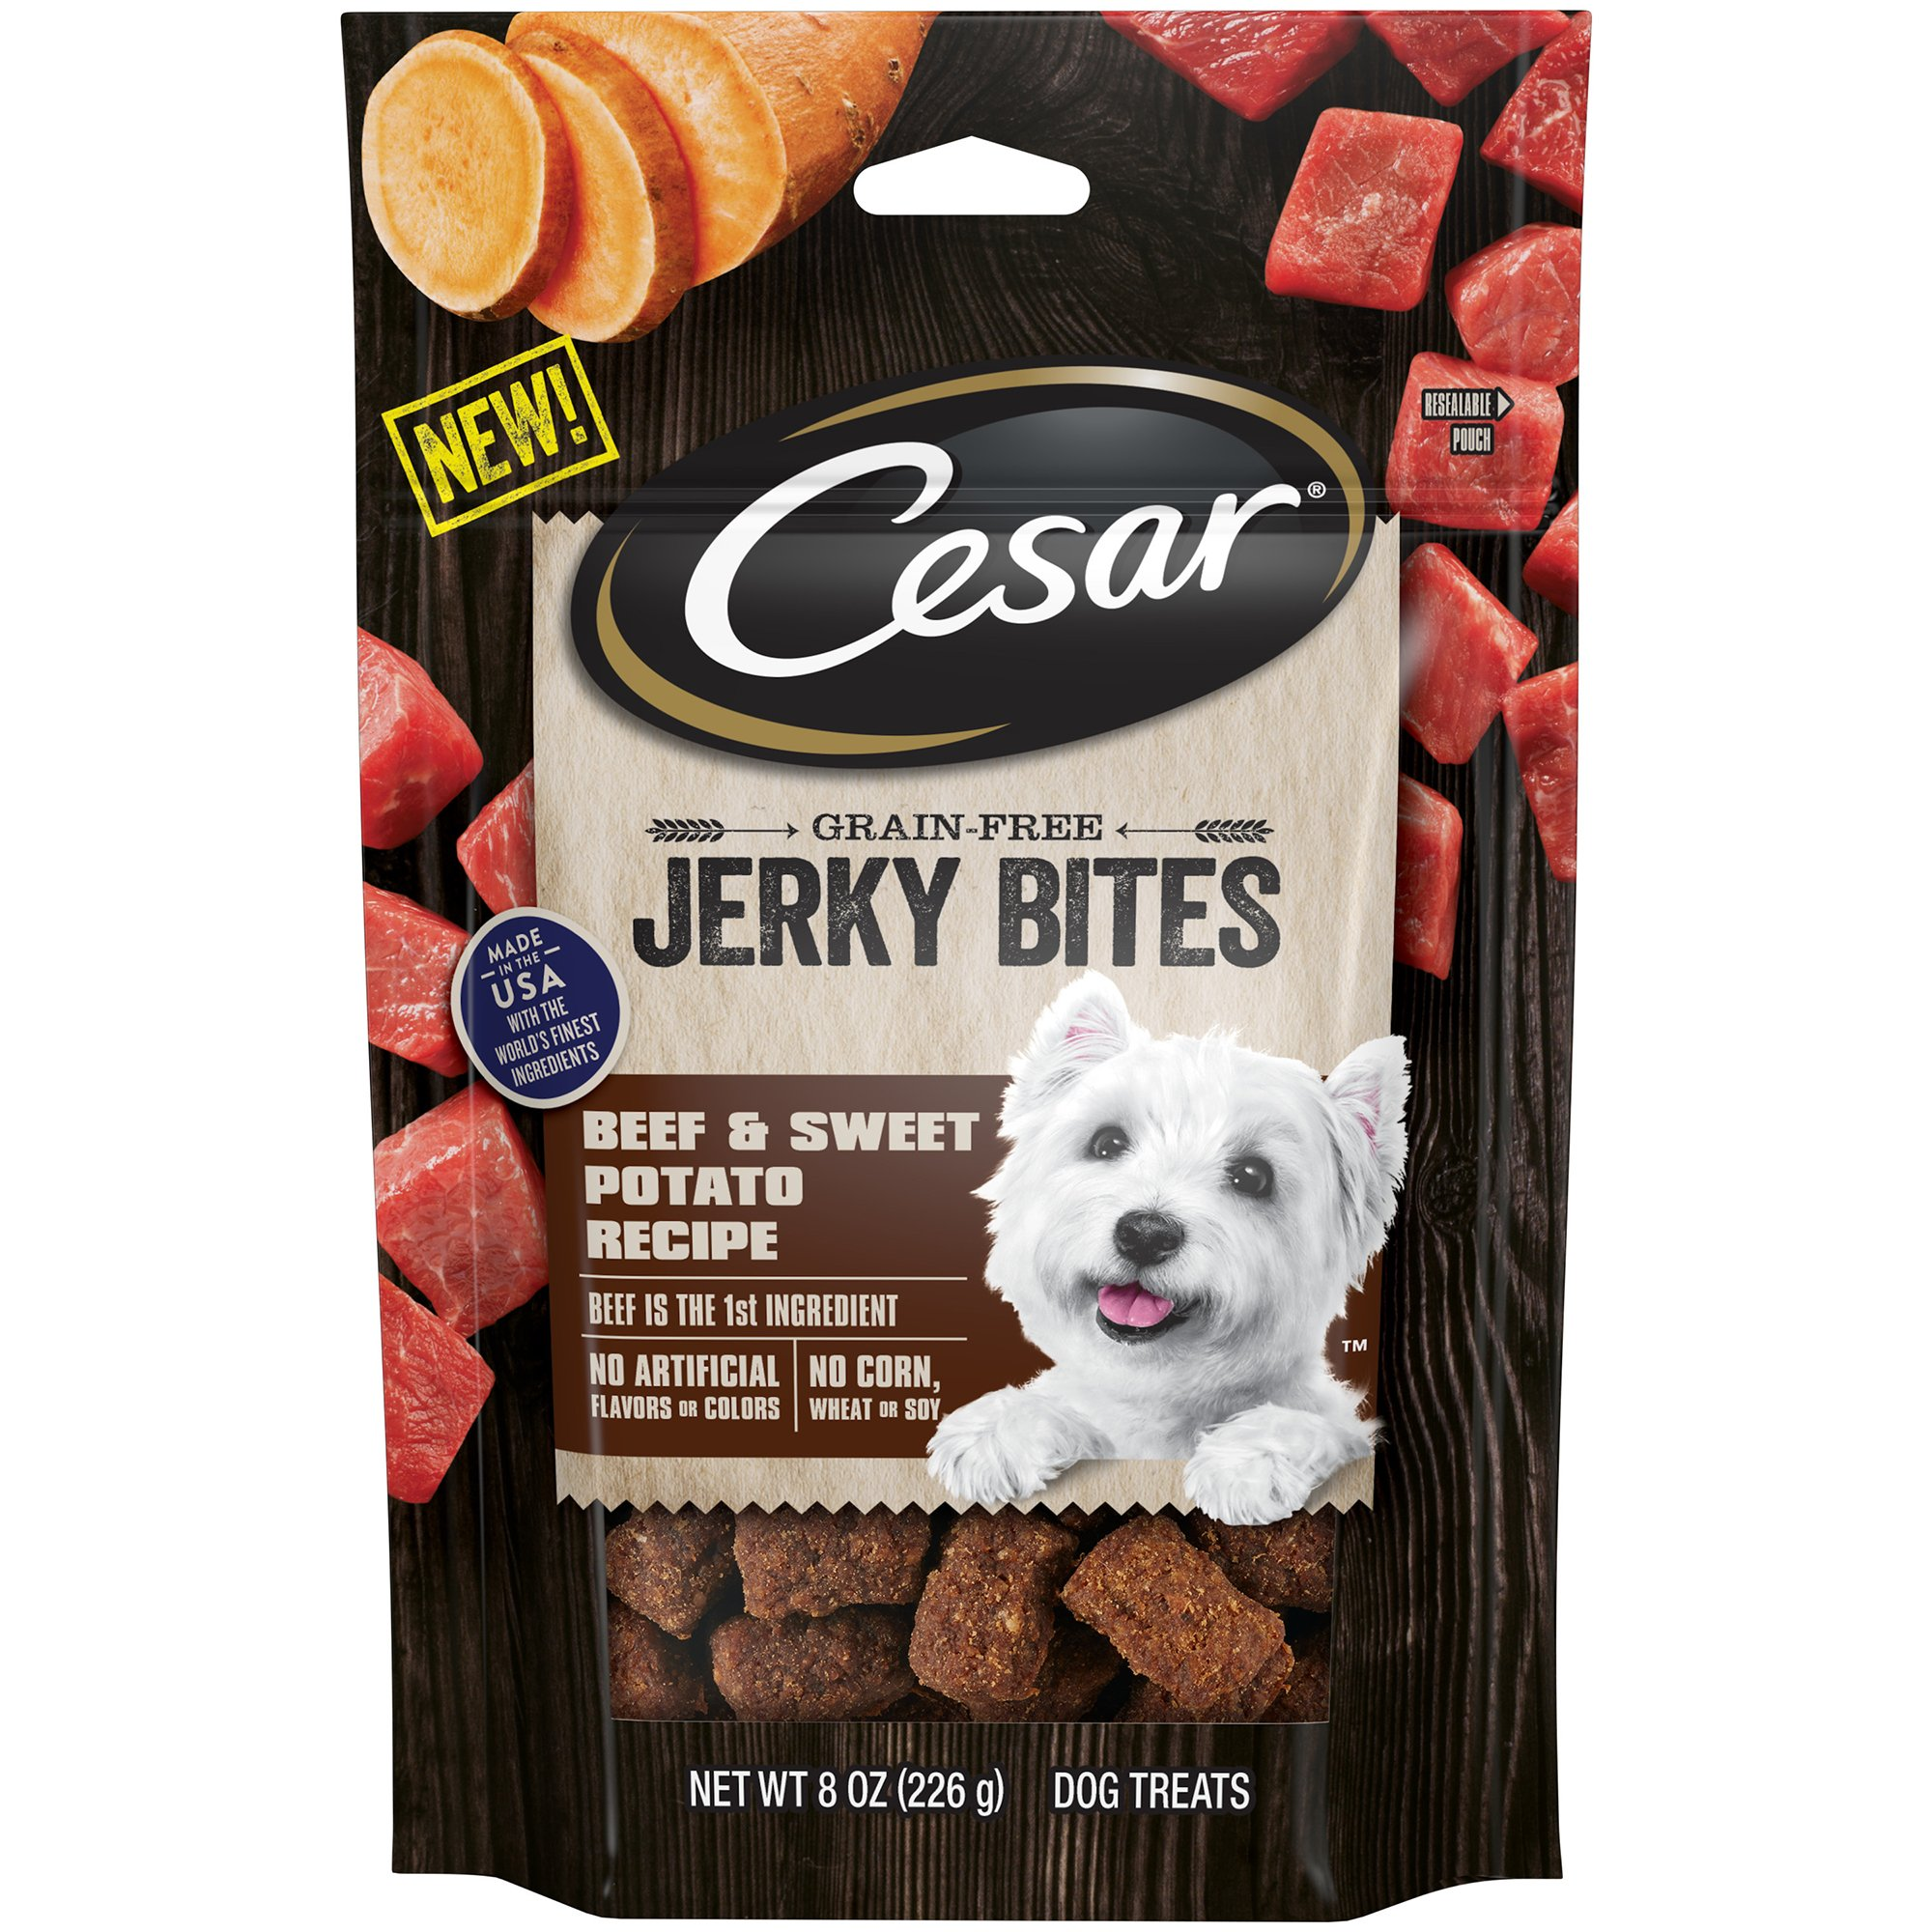 Cesar Jerky Bites Grain Free Dog Treats Beef & Sweet Potato Recipe, (6) 8 Oz. Pouches